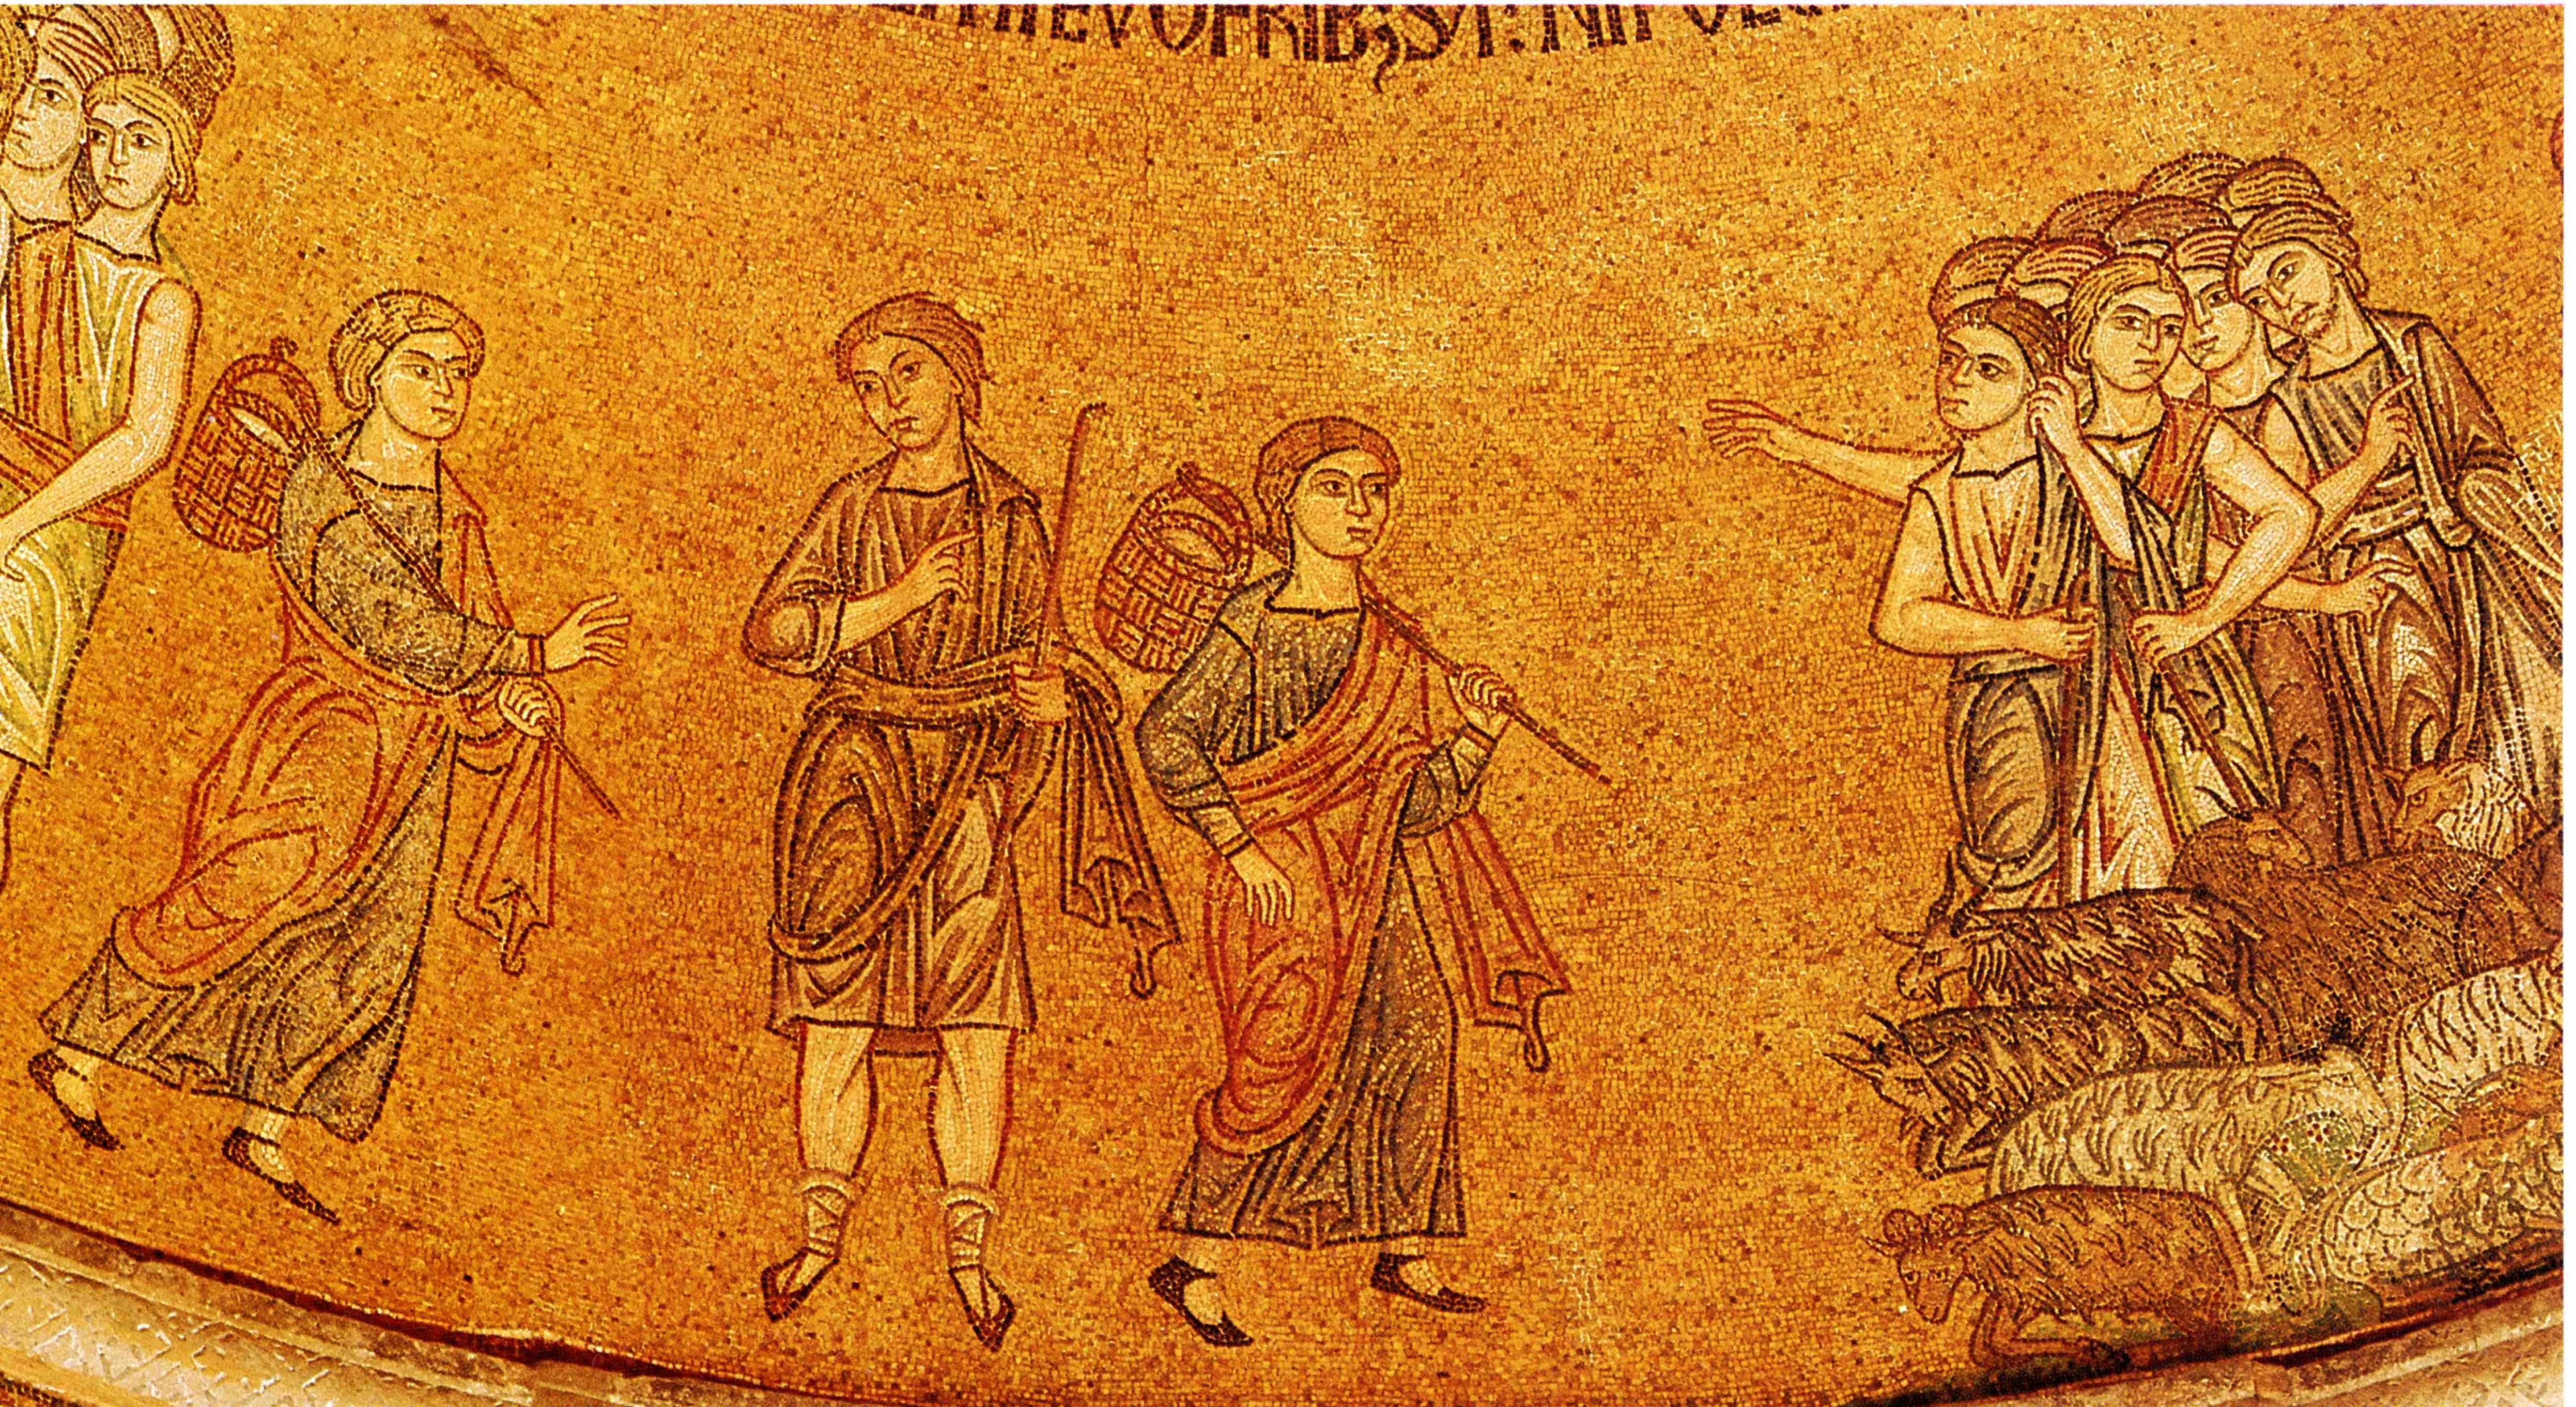 Культура византии в картинках